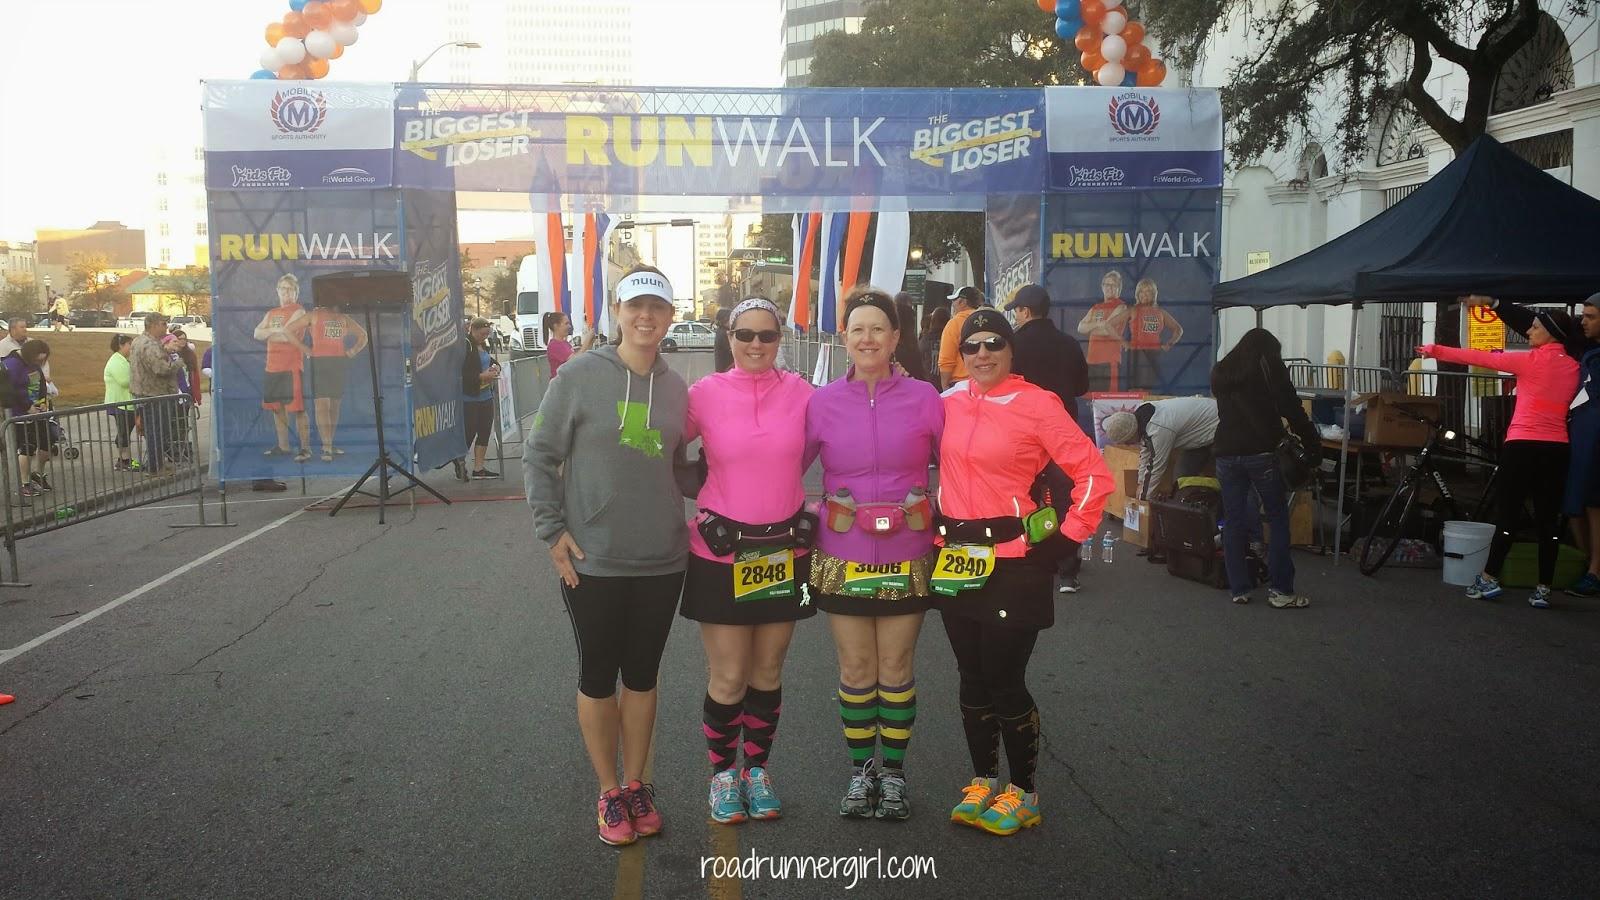 Road Runner Girl: The Biggest Loser RunWalk Mobile Race